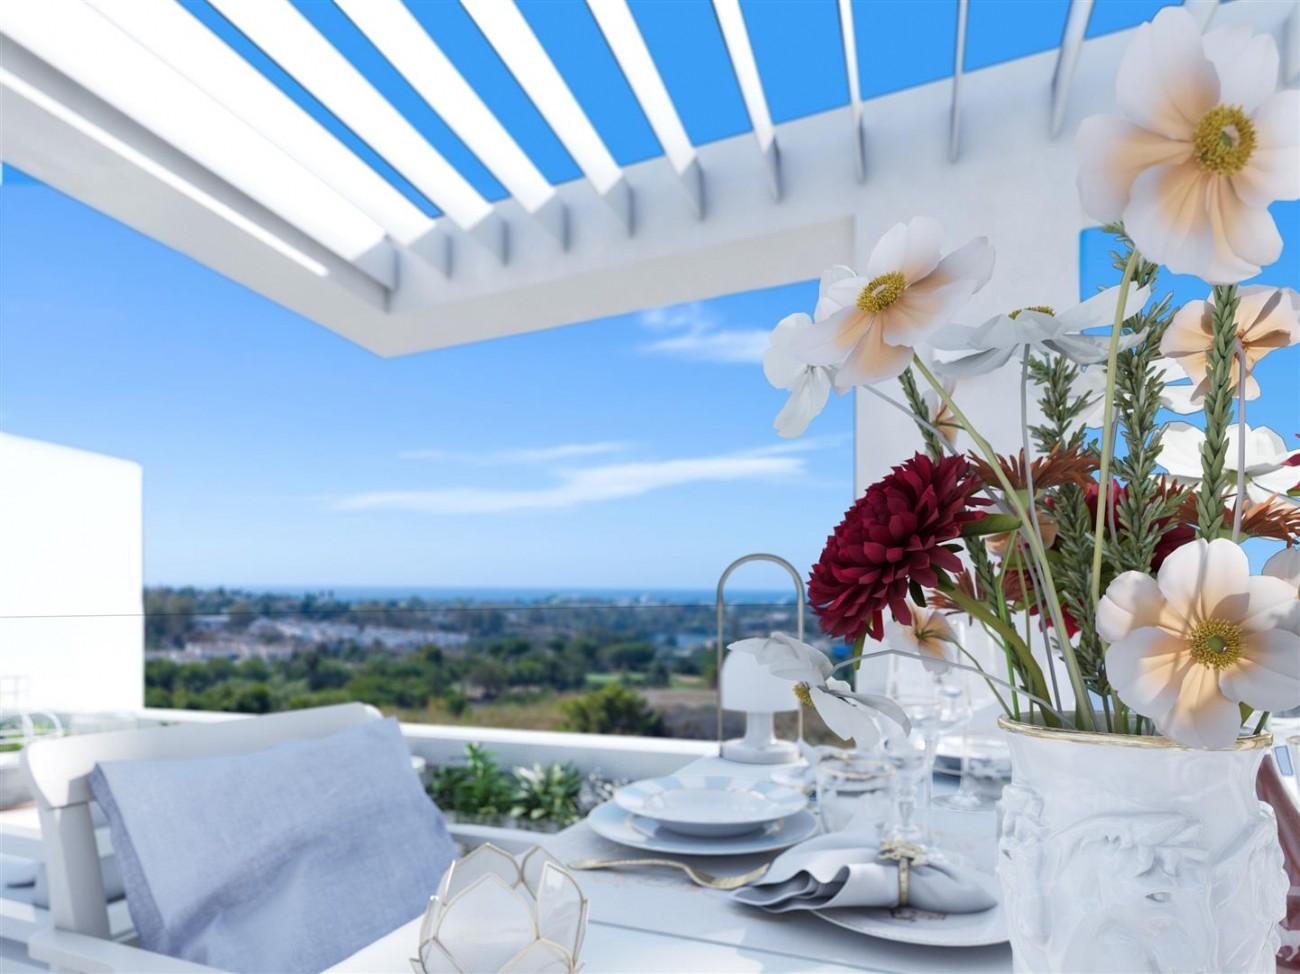 New Contemporary Apartments for sale Benahavis Spain (7) (Large)